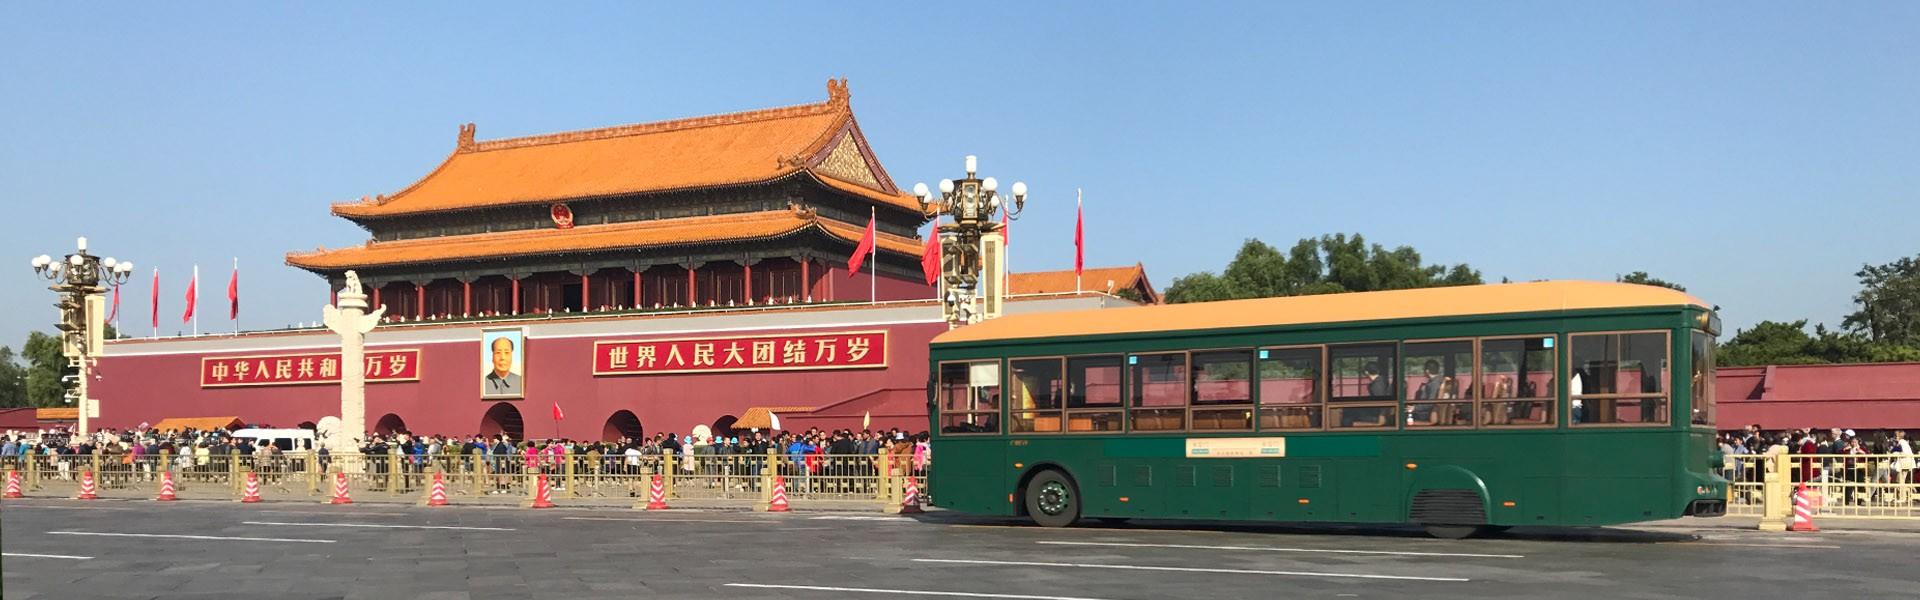 Tiananmen'1920x600'1